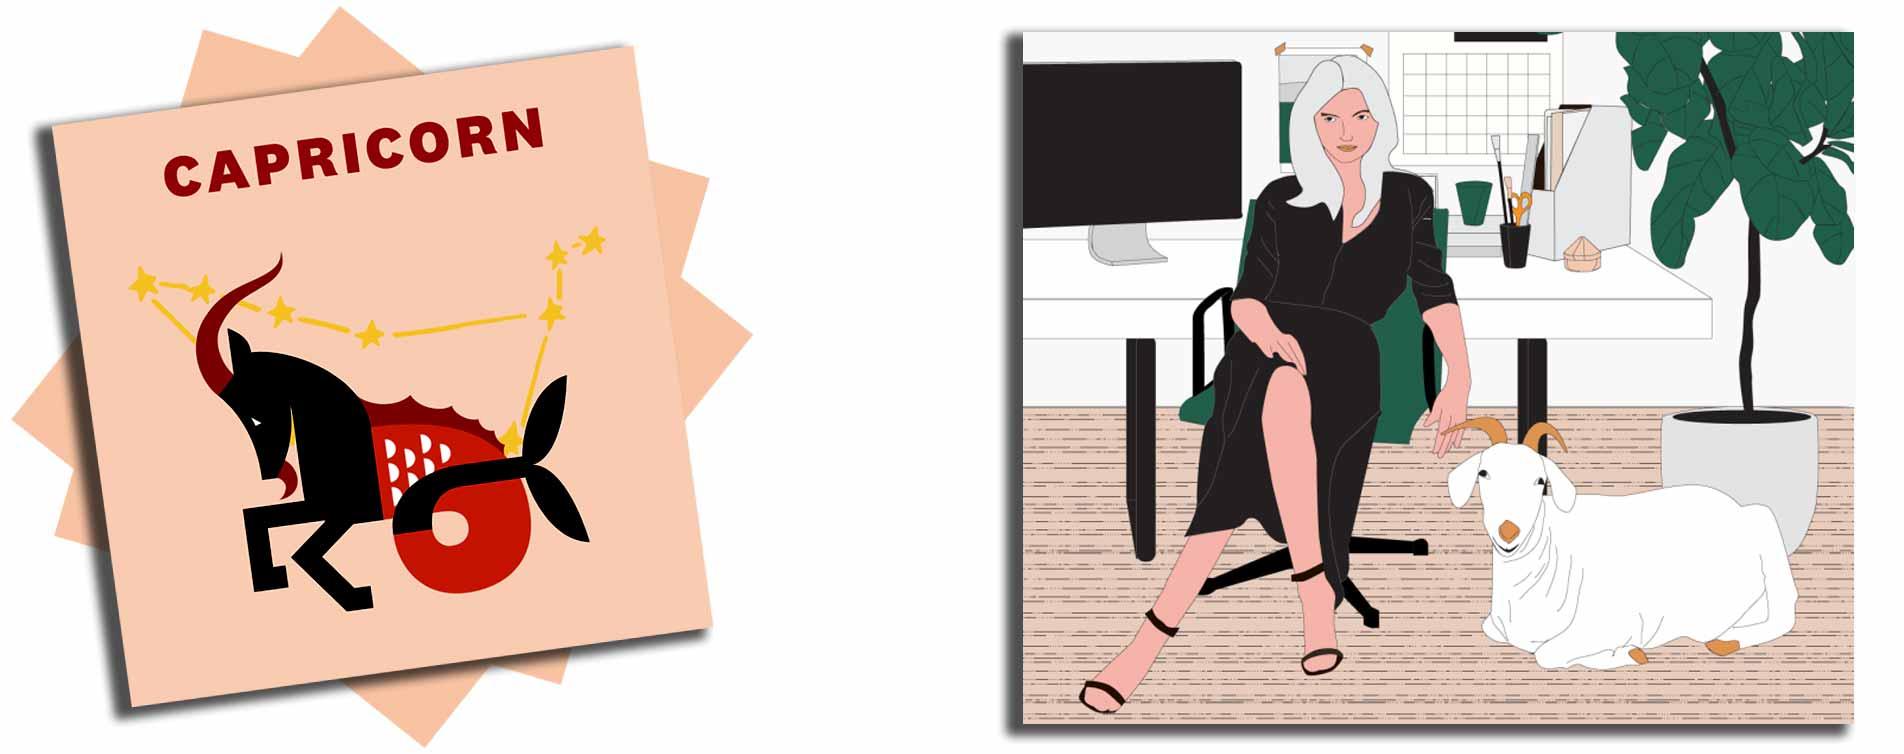 Design Your Home Based  Your Astrological Sign 16 - دکوراسیون ماه تولد : ایده های چیدمان بر اساس نشان ماه تولد شما